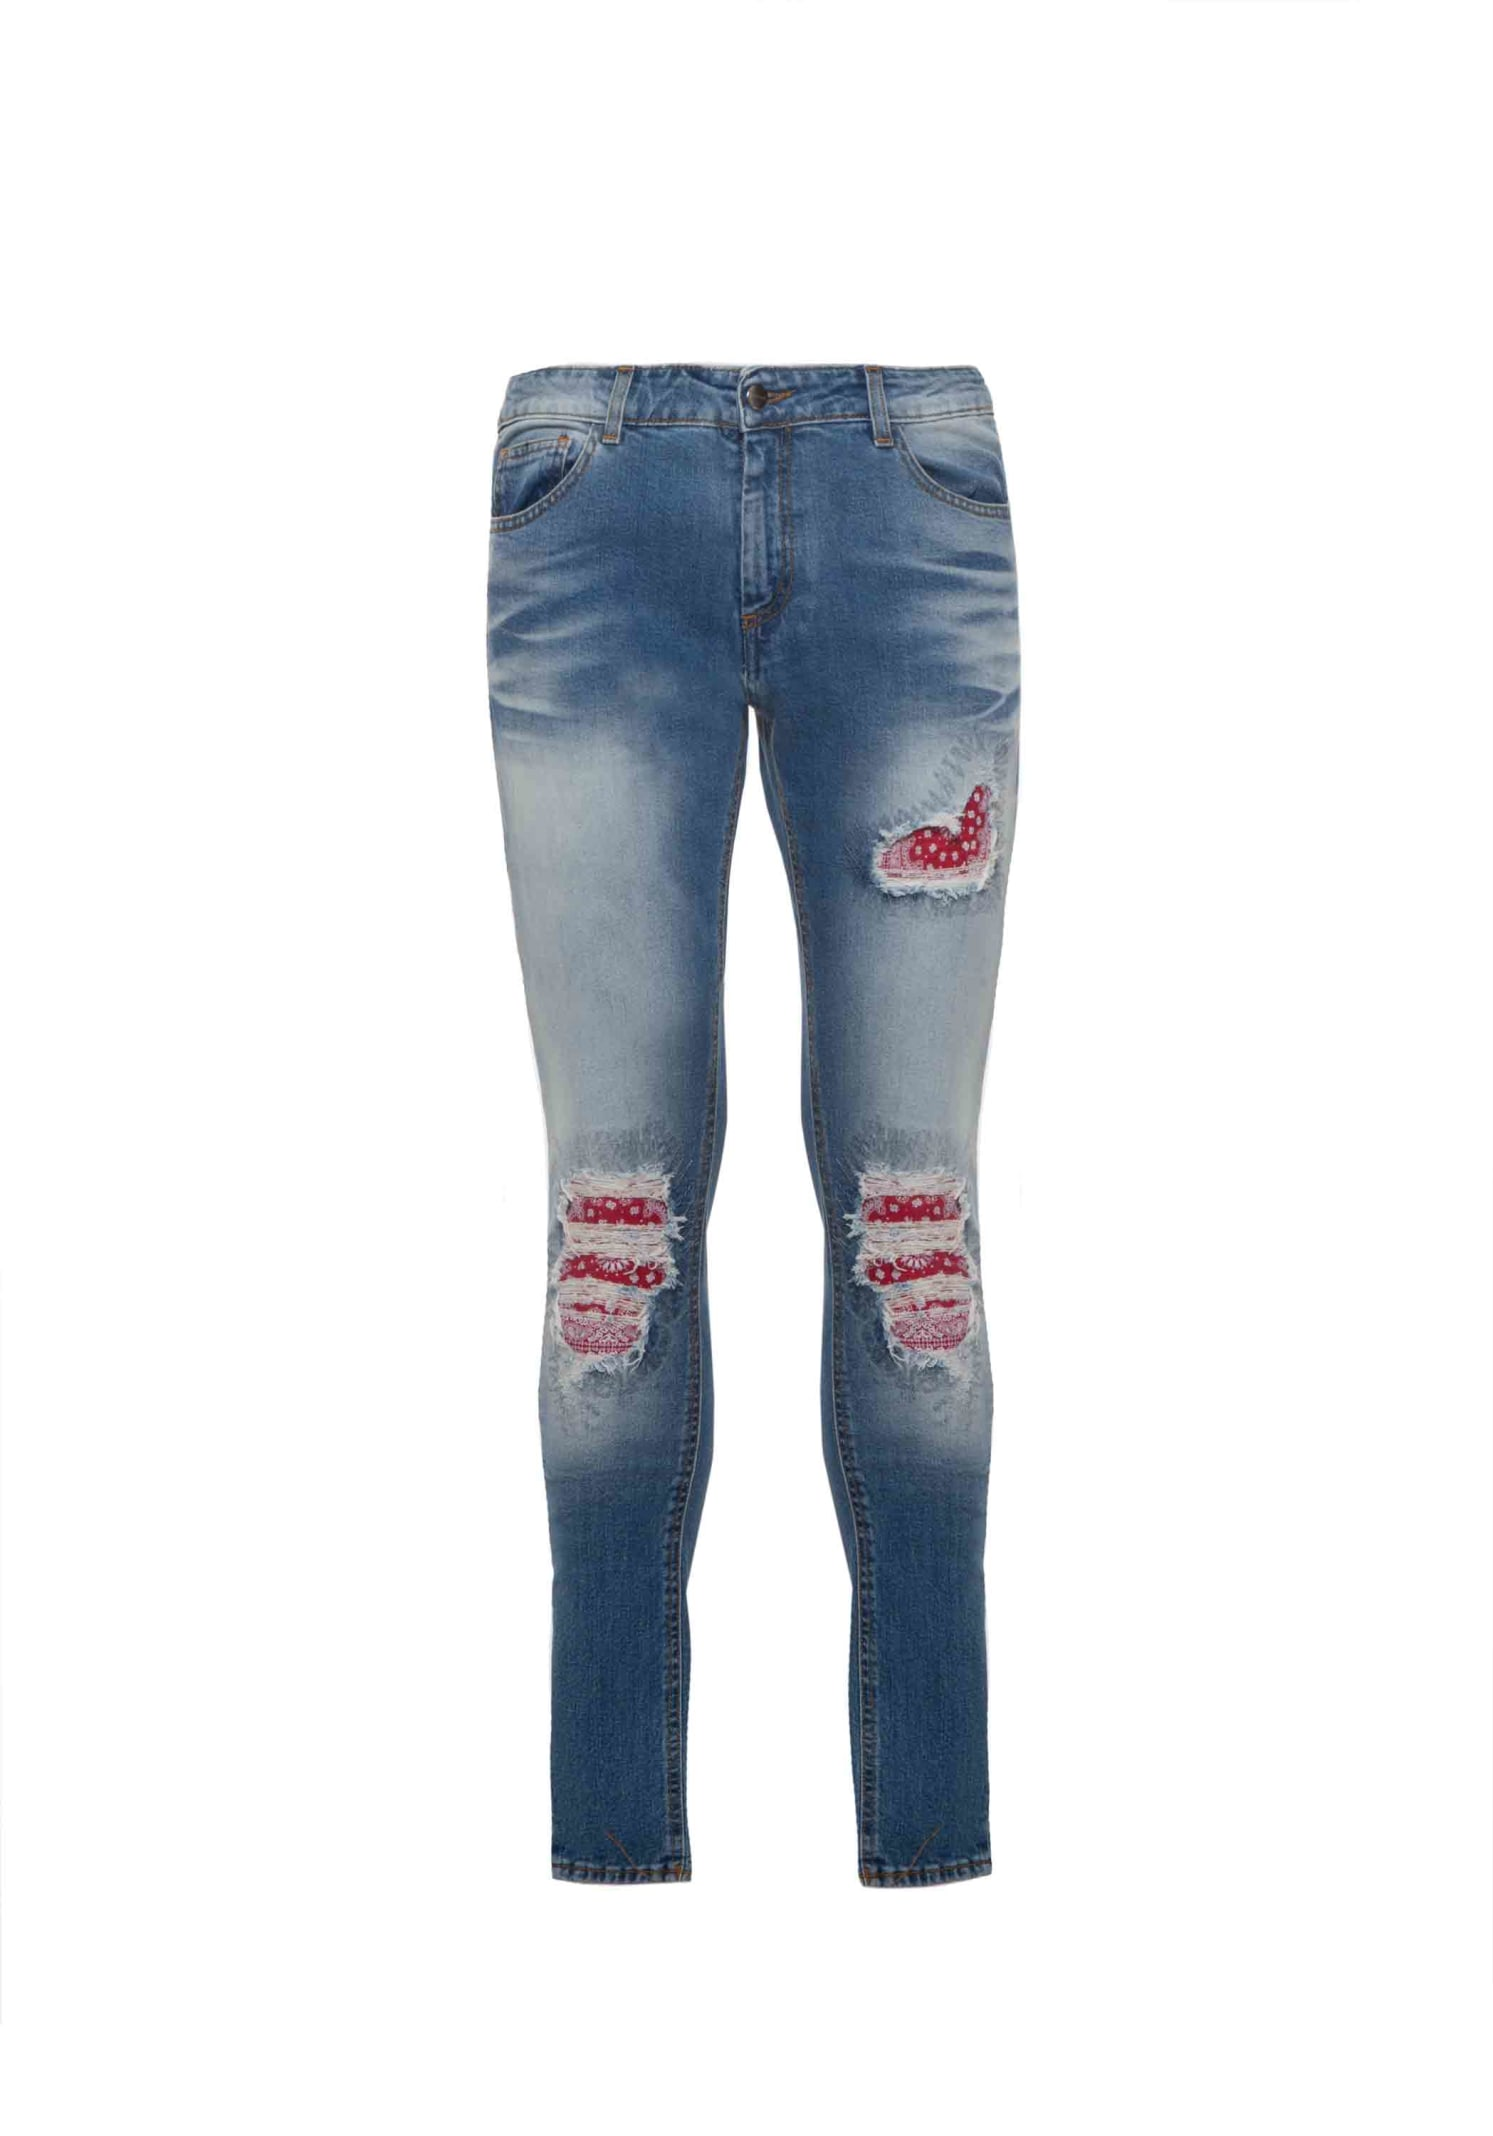 Jeans Denim Patch Bandana Blue